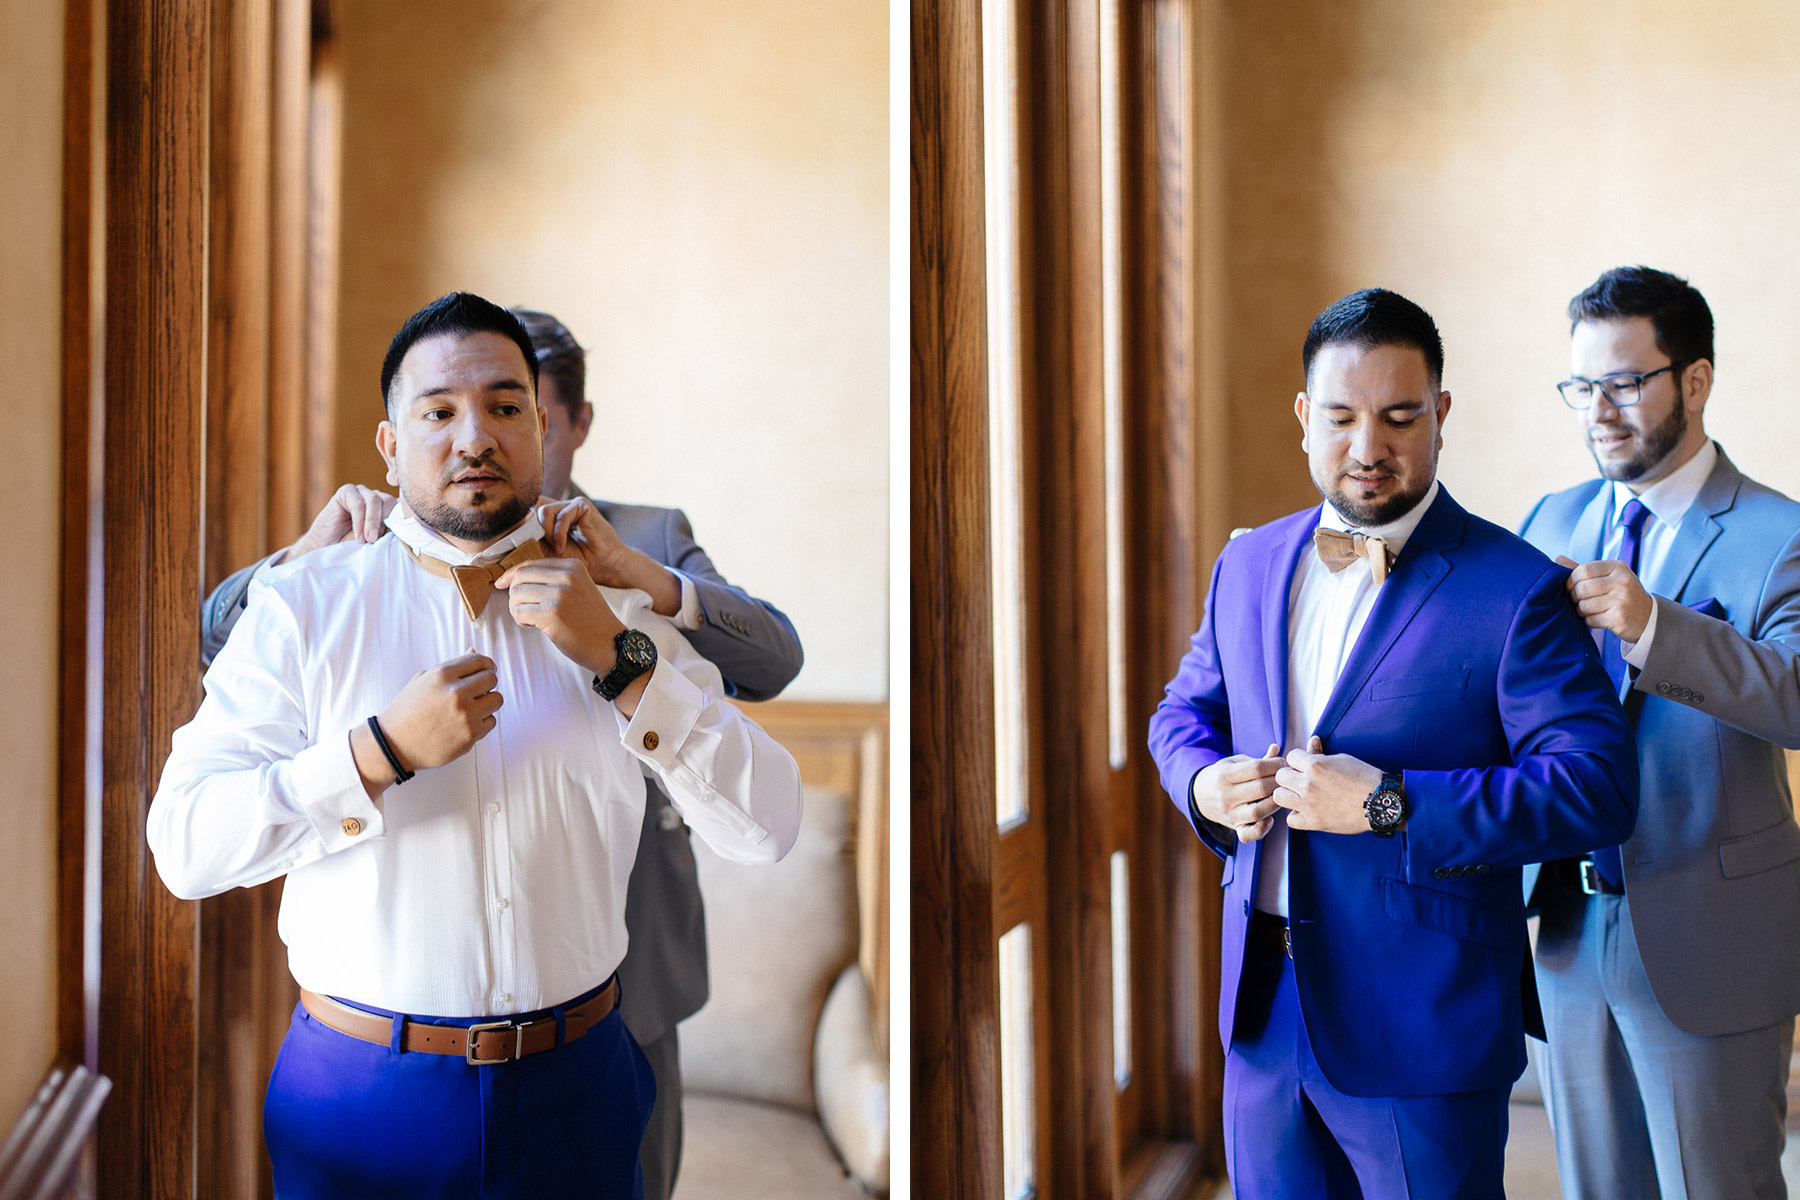 161029-Luxium-Weddings-Arizona-Jeff-Griselda-First-Look-Val-Vista-Lakes-Gilber-019a.jpg